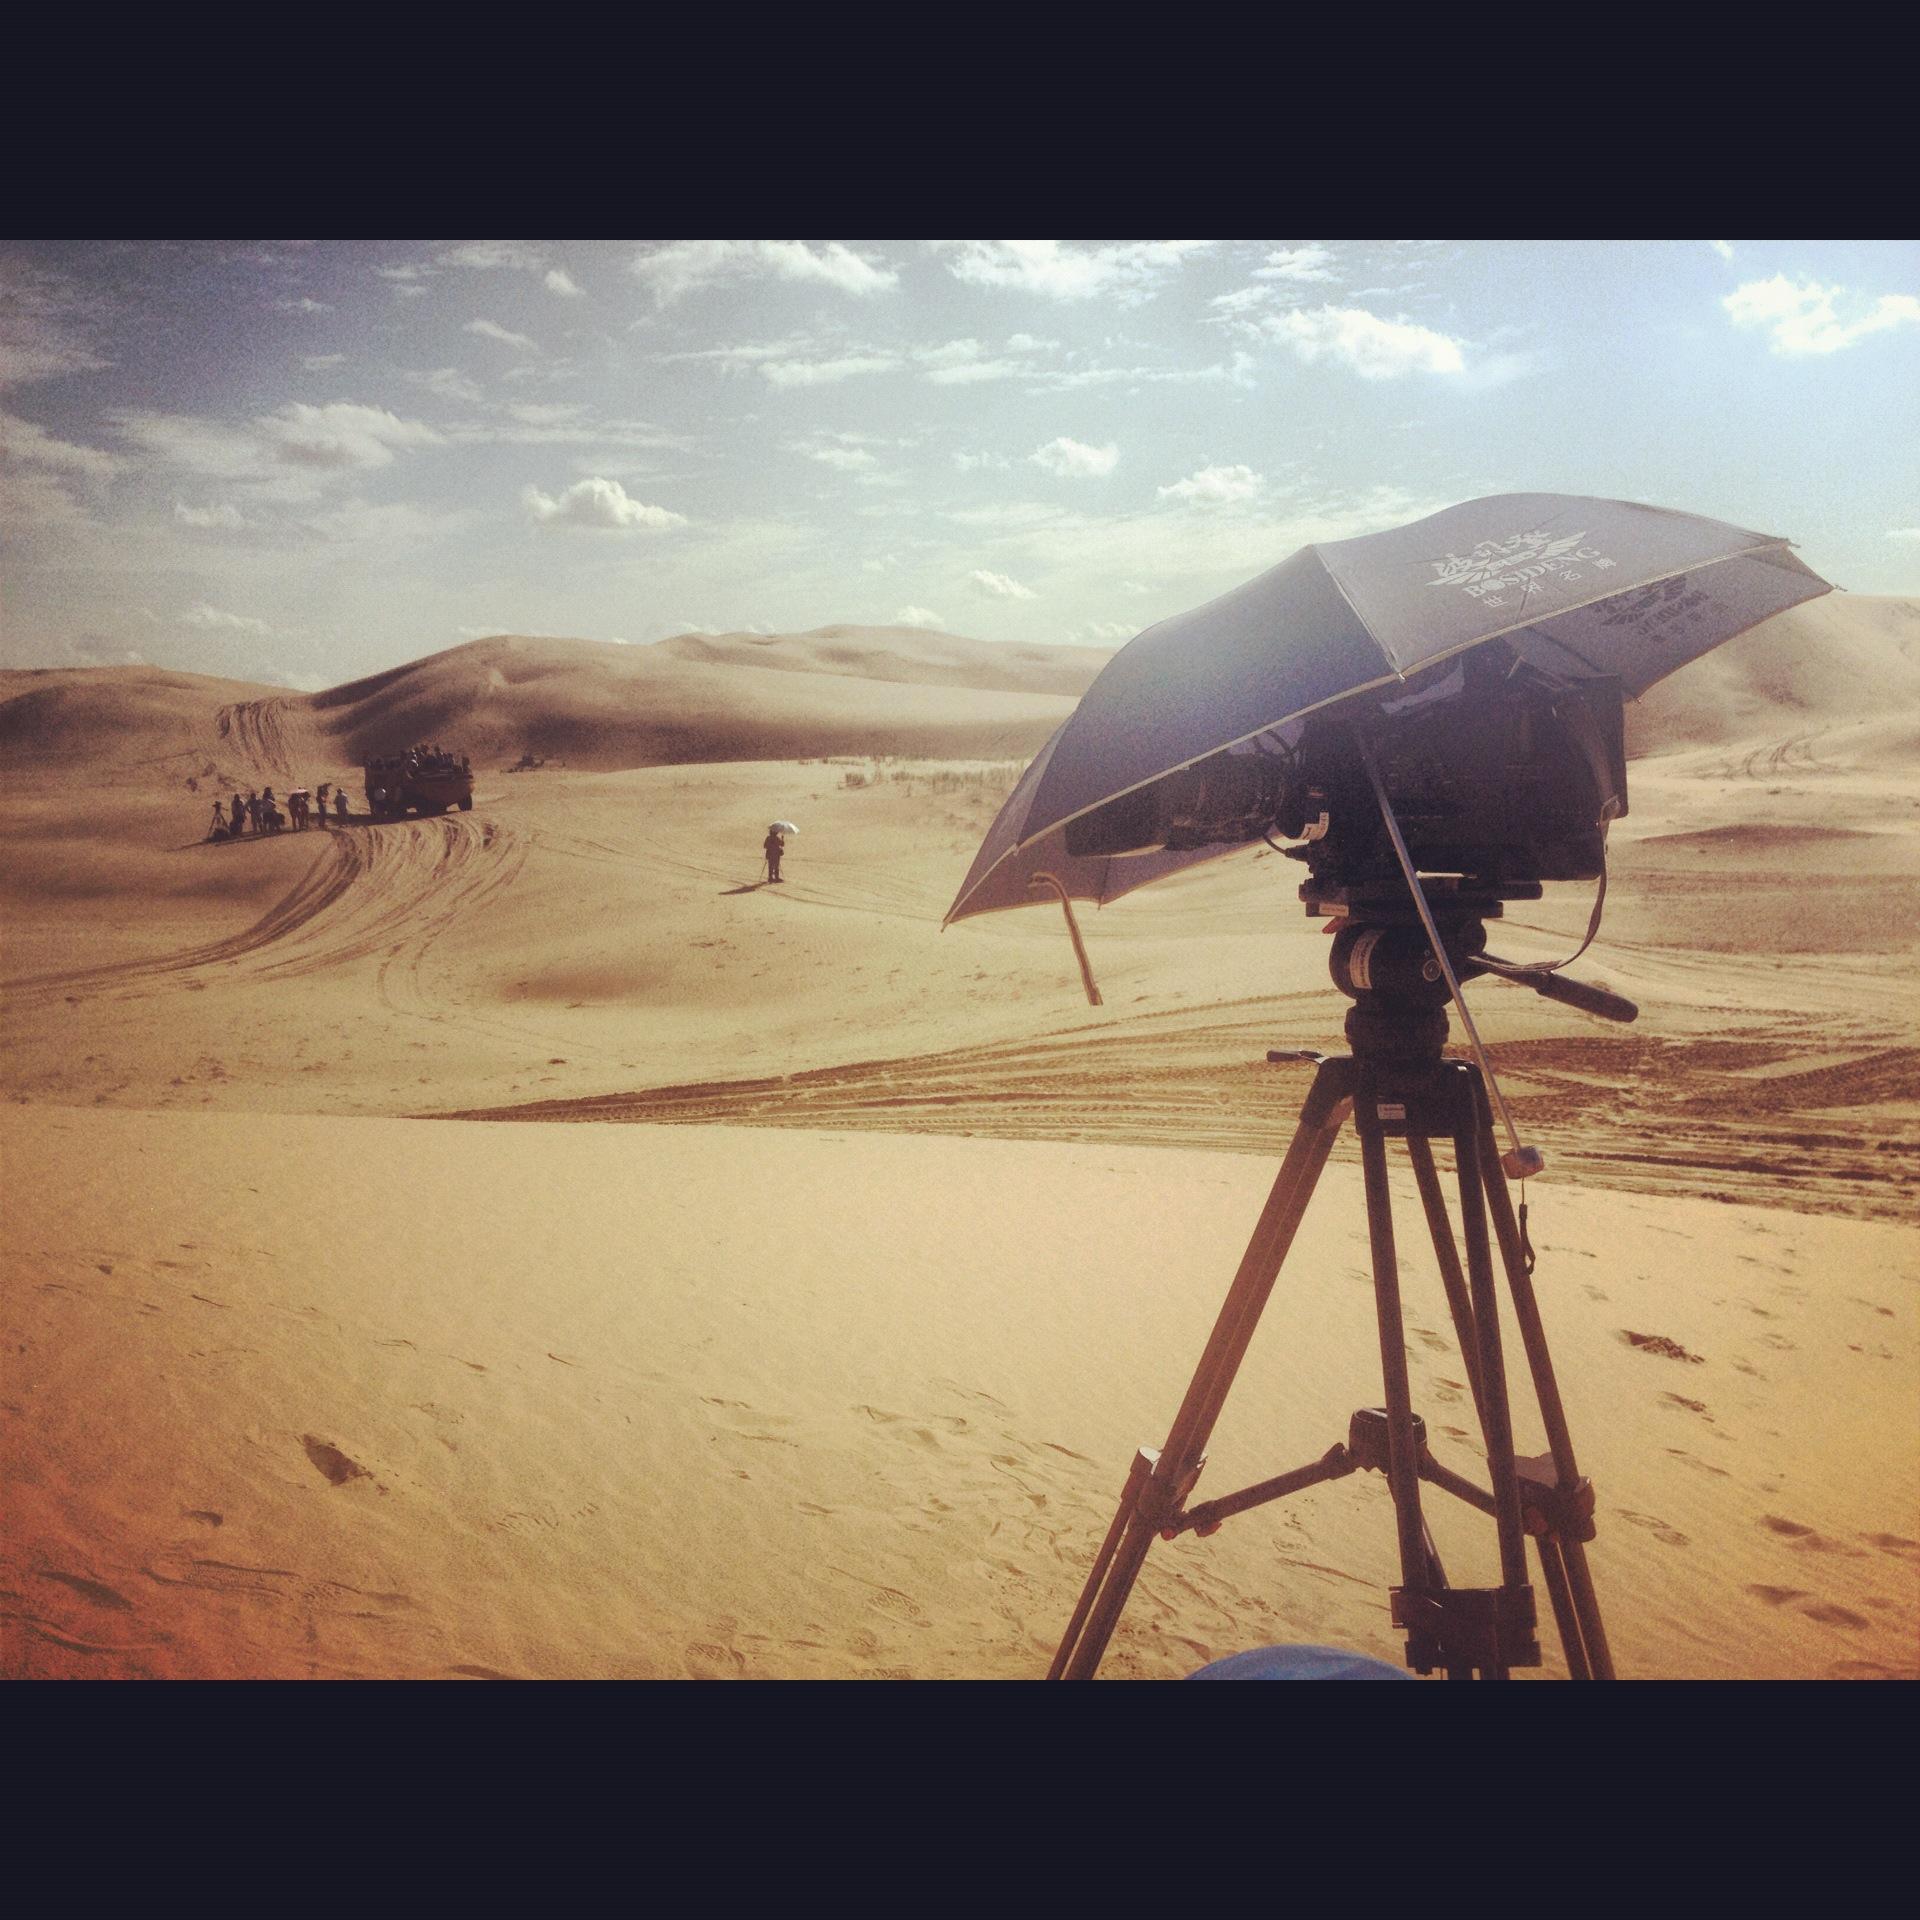 Gobi Desert - Richard Cornelius - Director of Photography